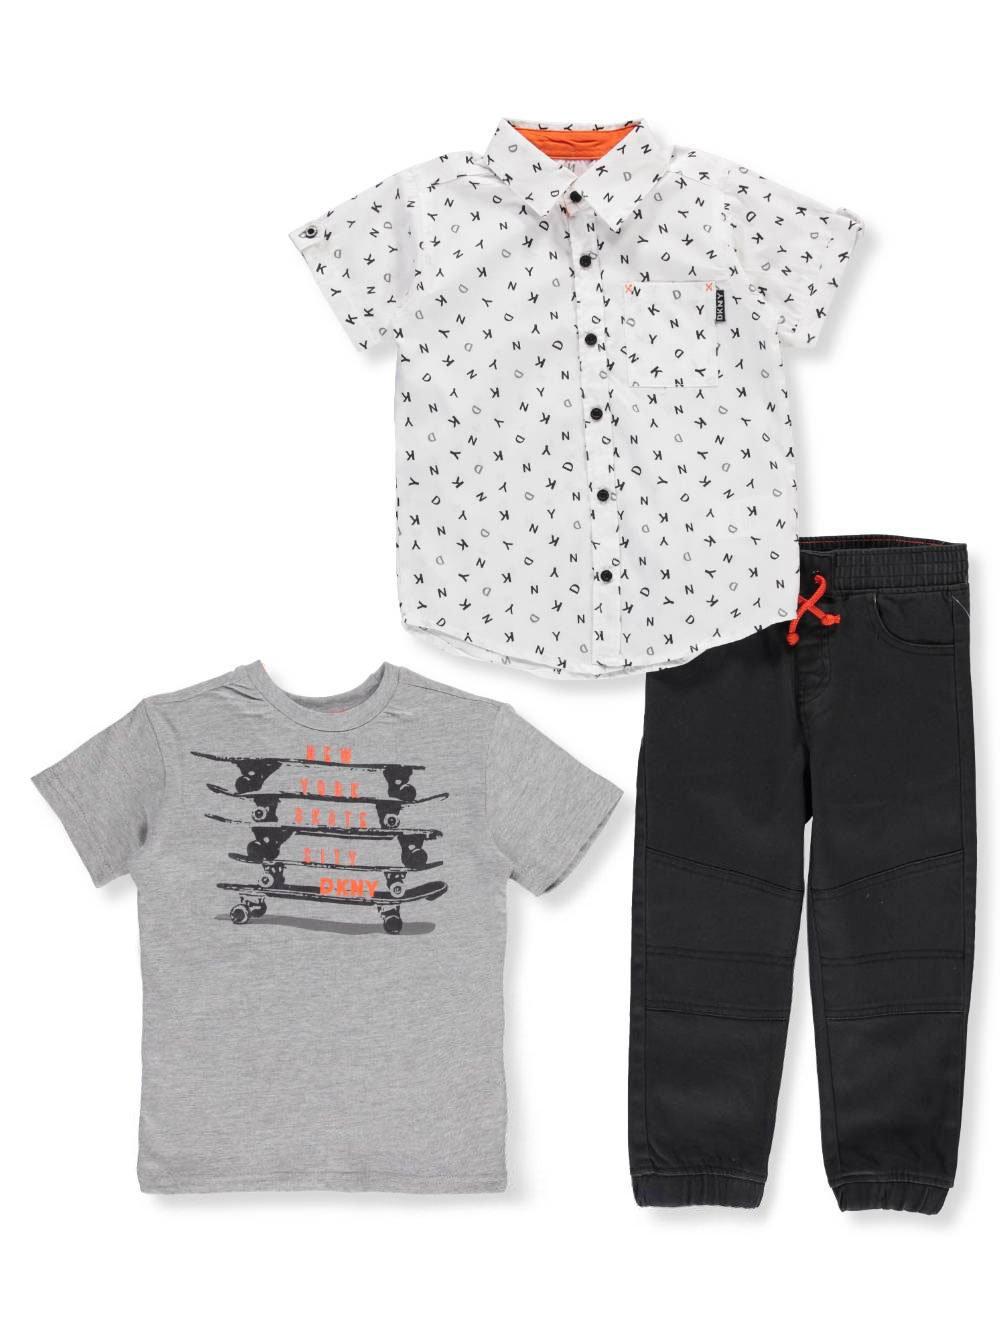 DKNY Toddler Boys' Soho Sport Shirt, T-Shirt and Pull-on Twill Jog Pant, Phantom, 2T